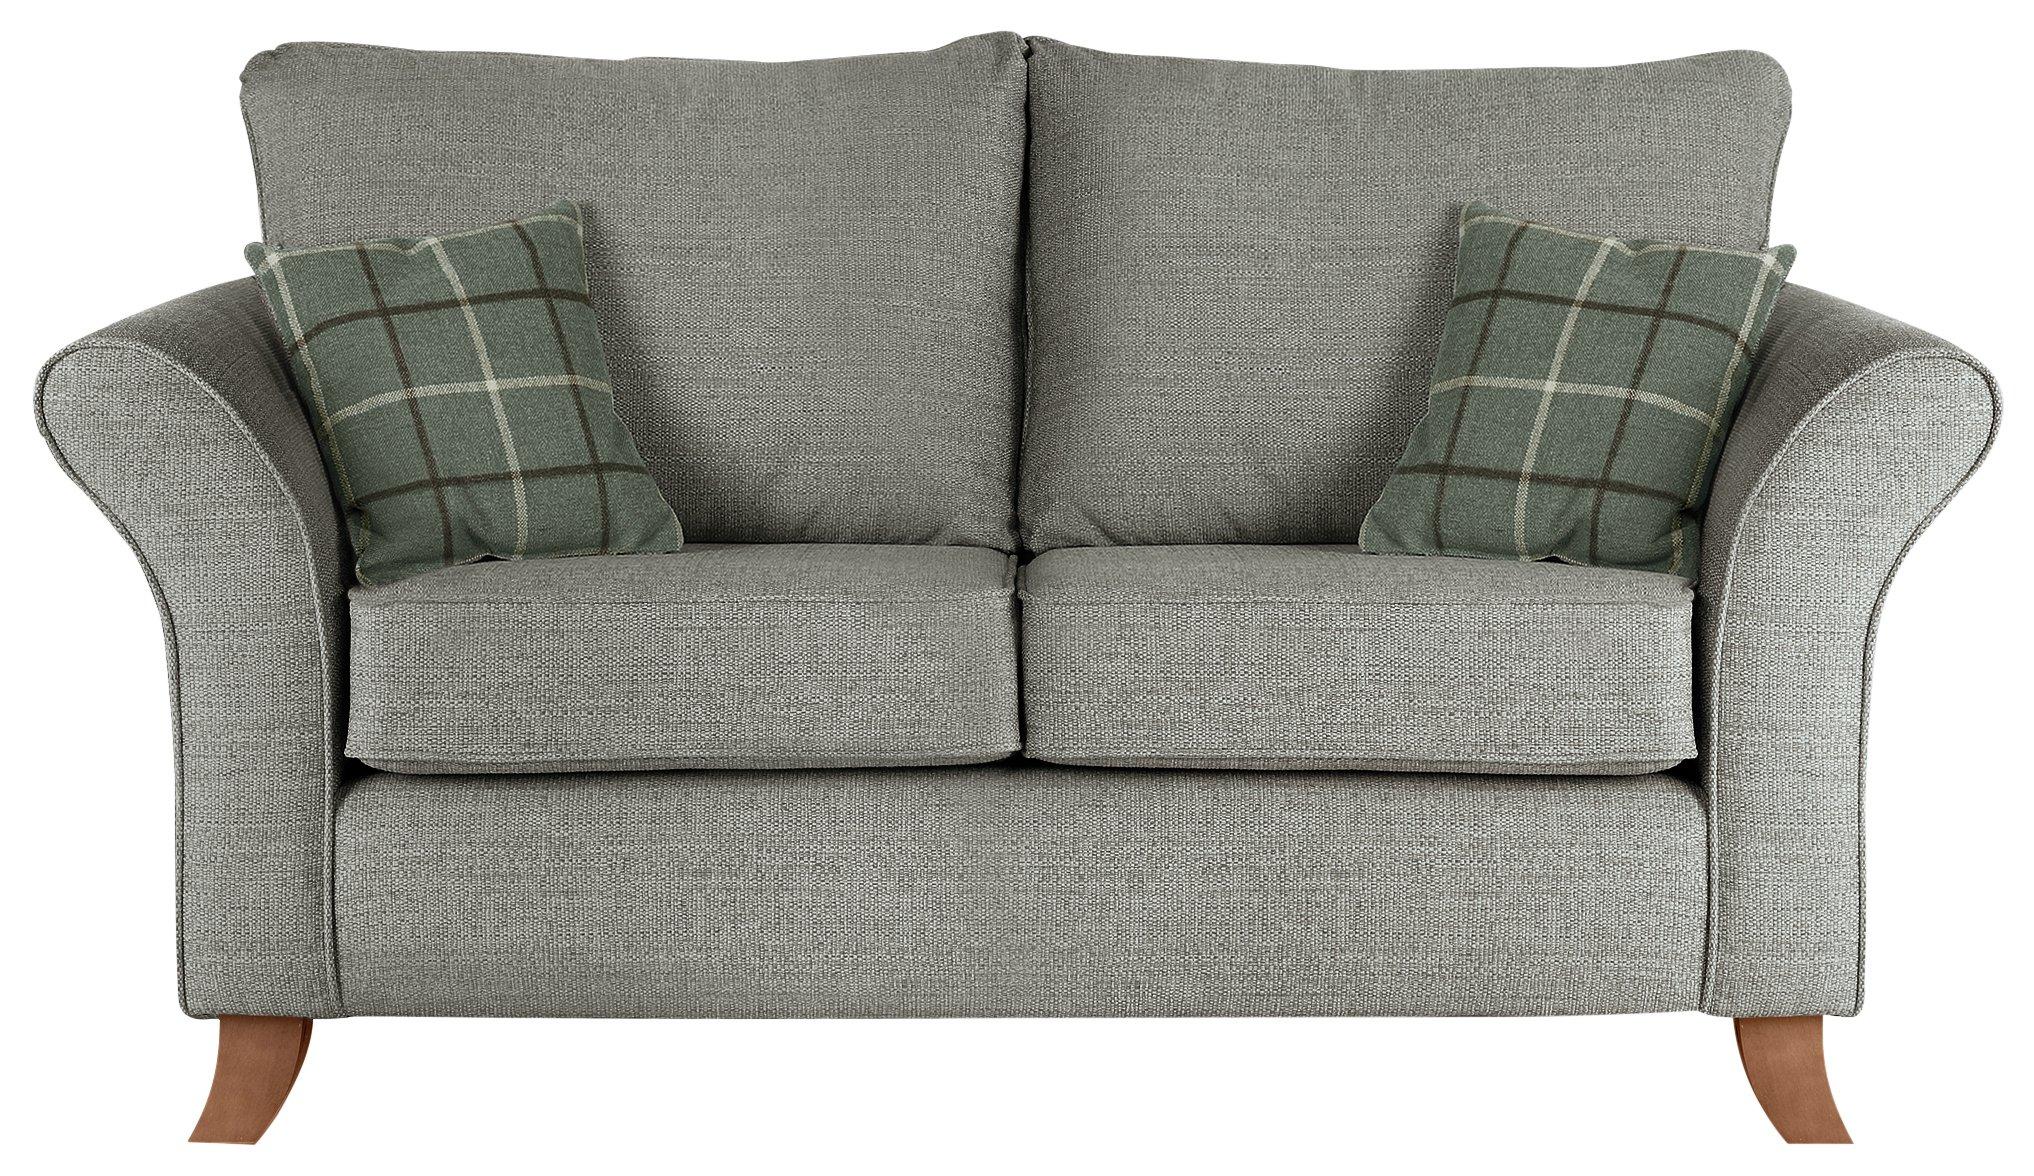 pratts corner sofas camerich sofa gumtree high back fabric uk baci living room